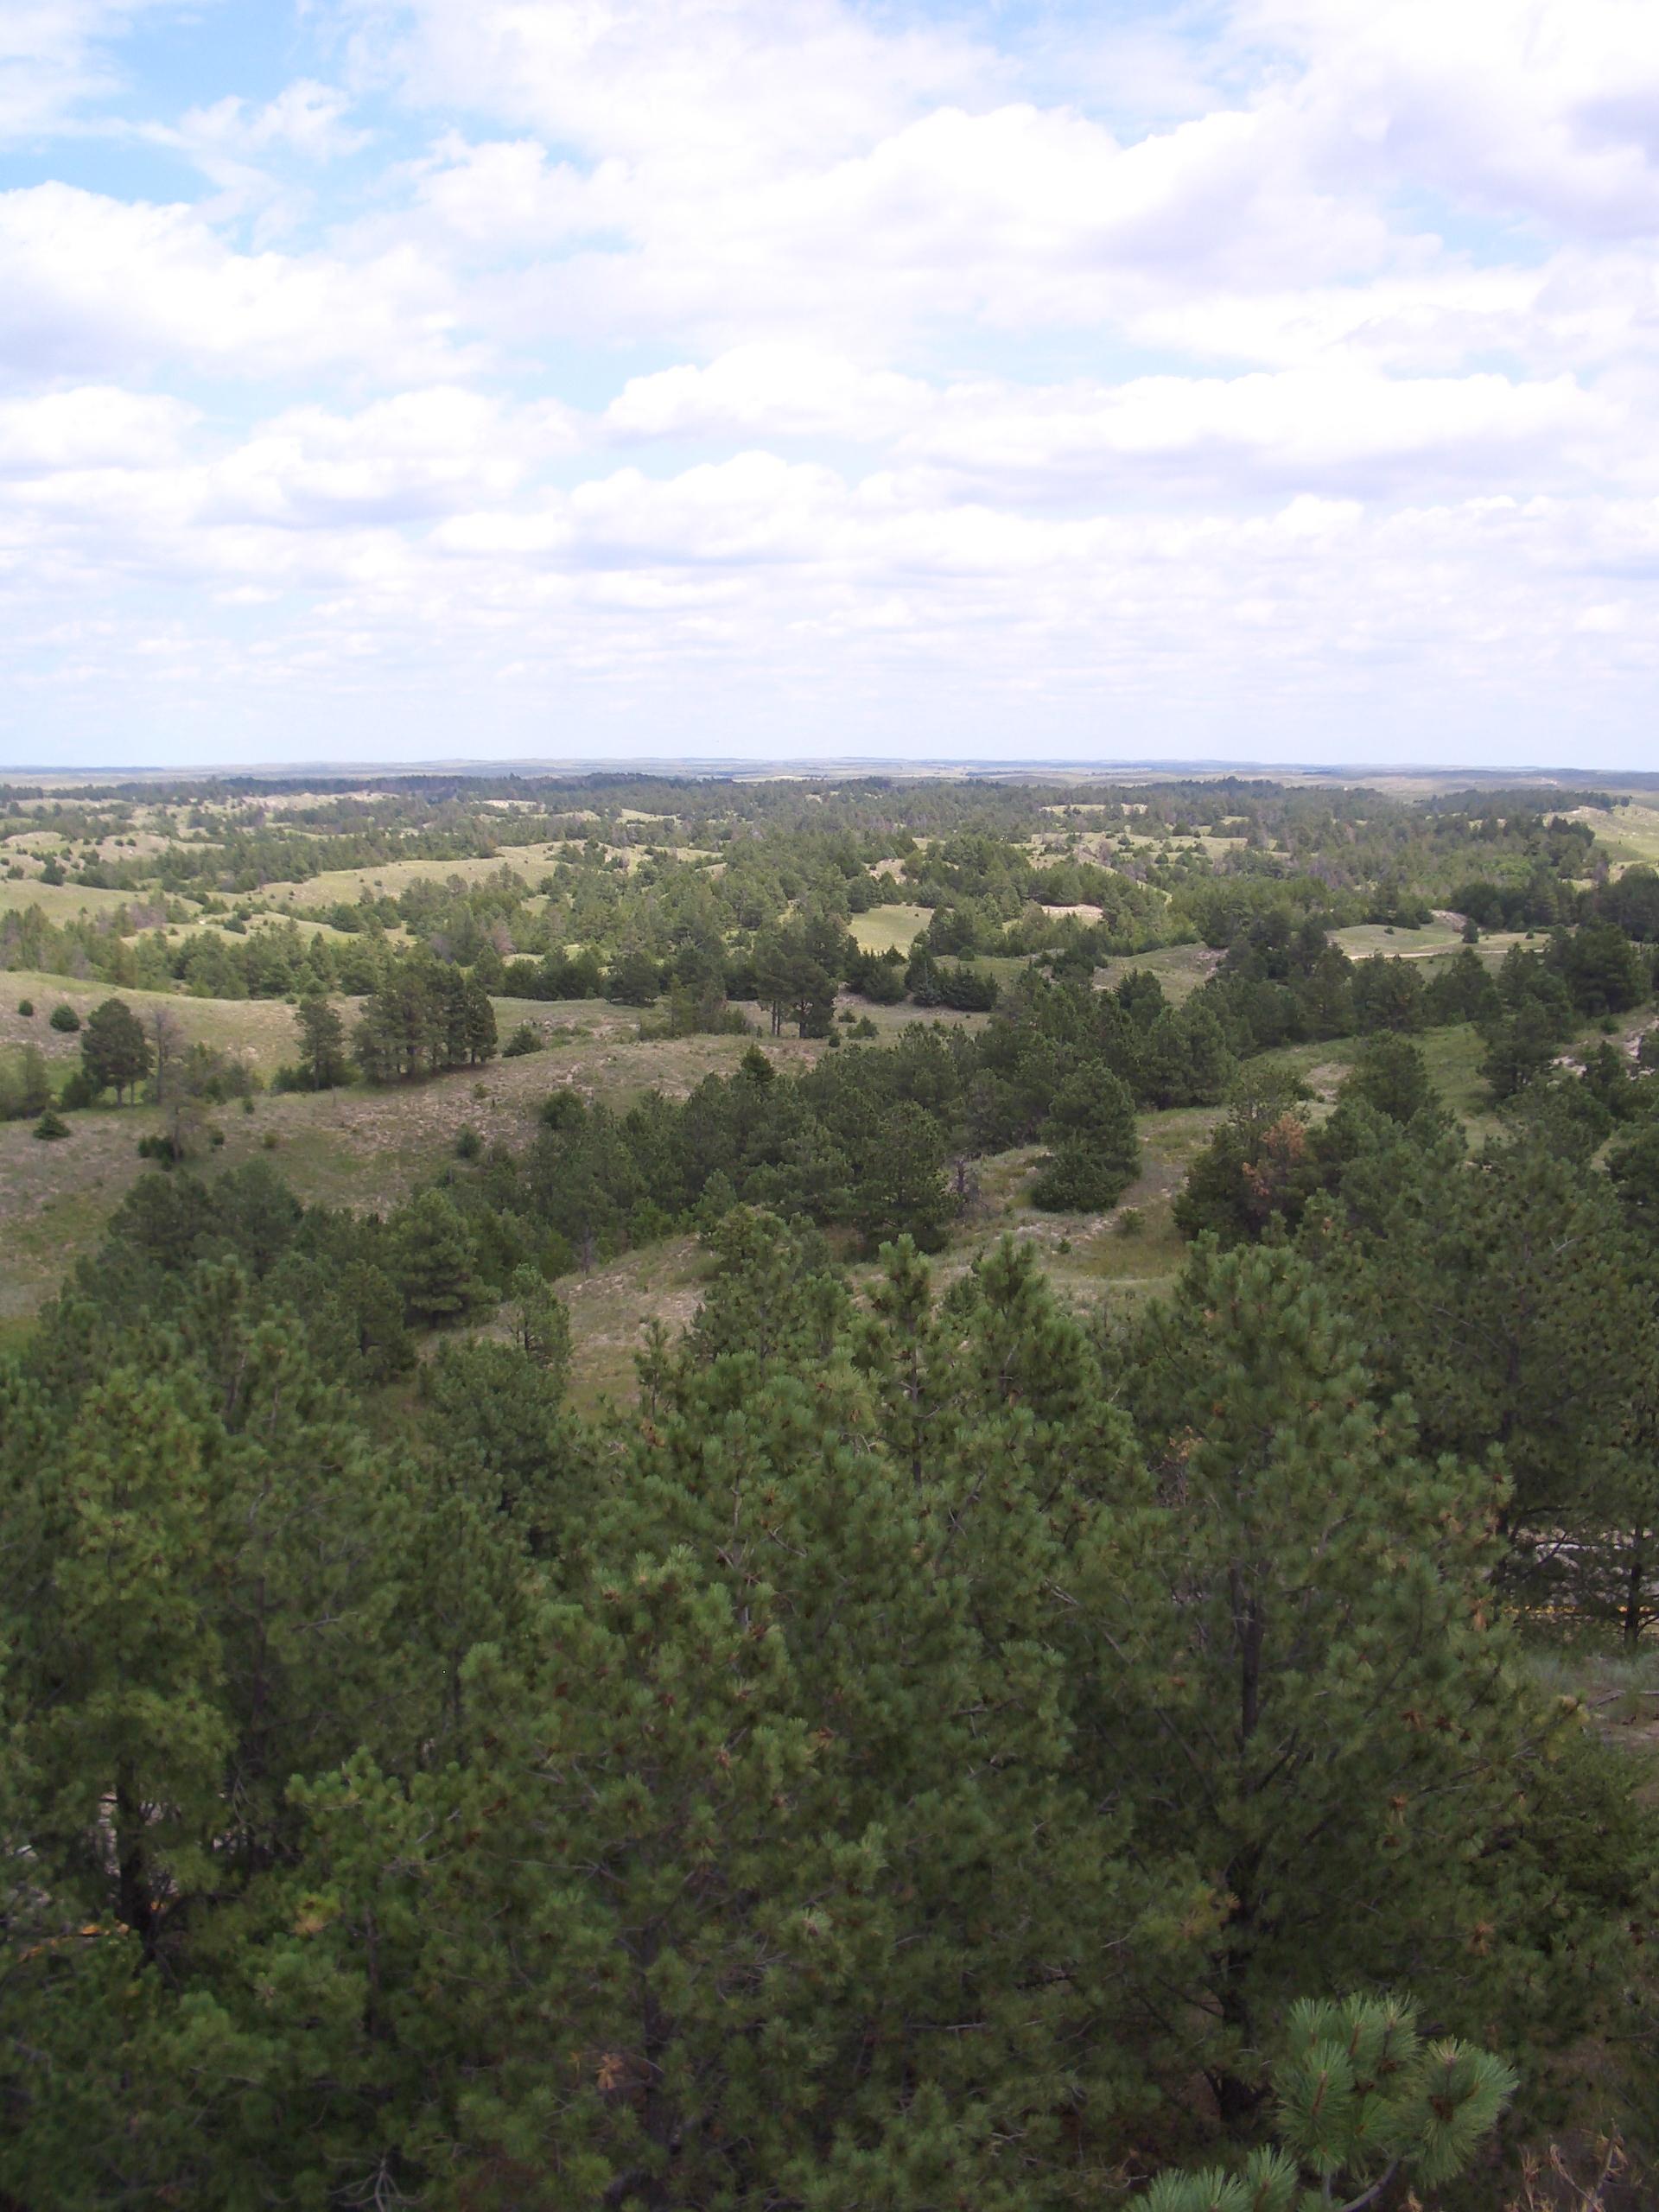 FileNebraska National Forest Bessey Ranger District No